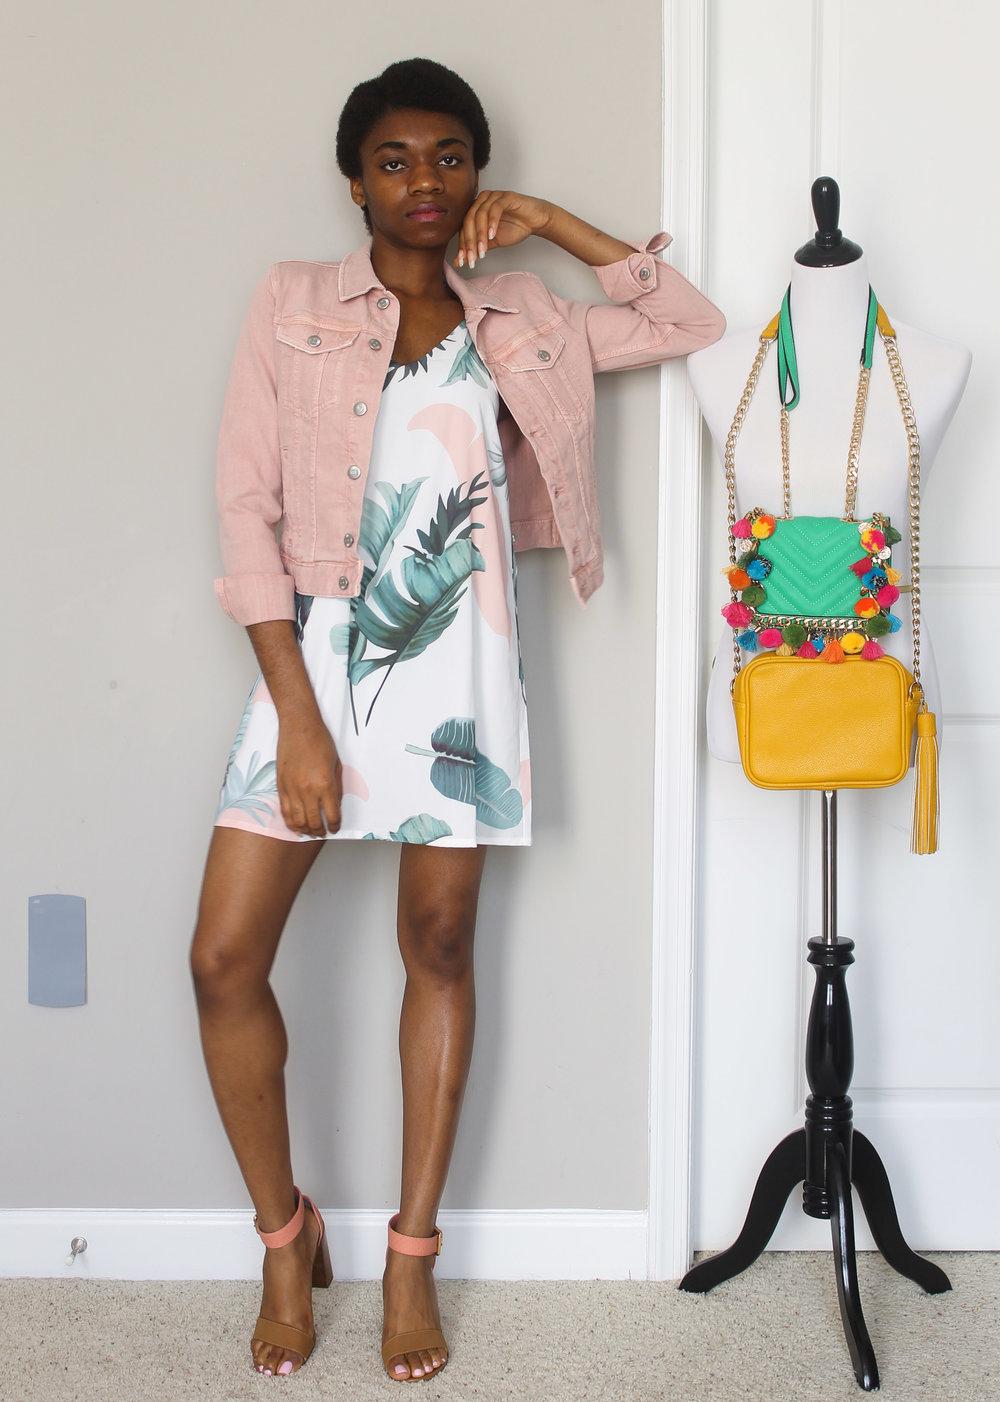 4WaystoWear-tropical-prints-dress 6.jpg